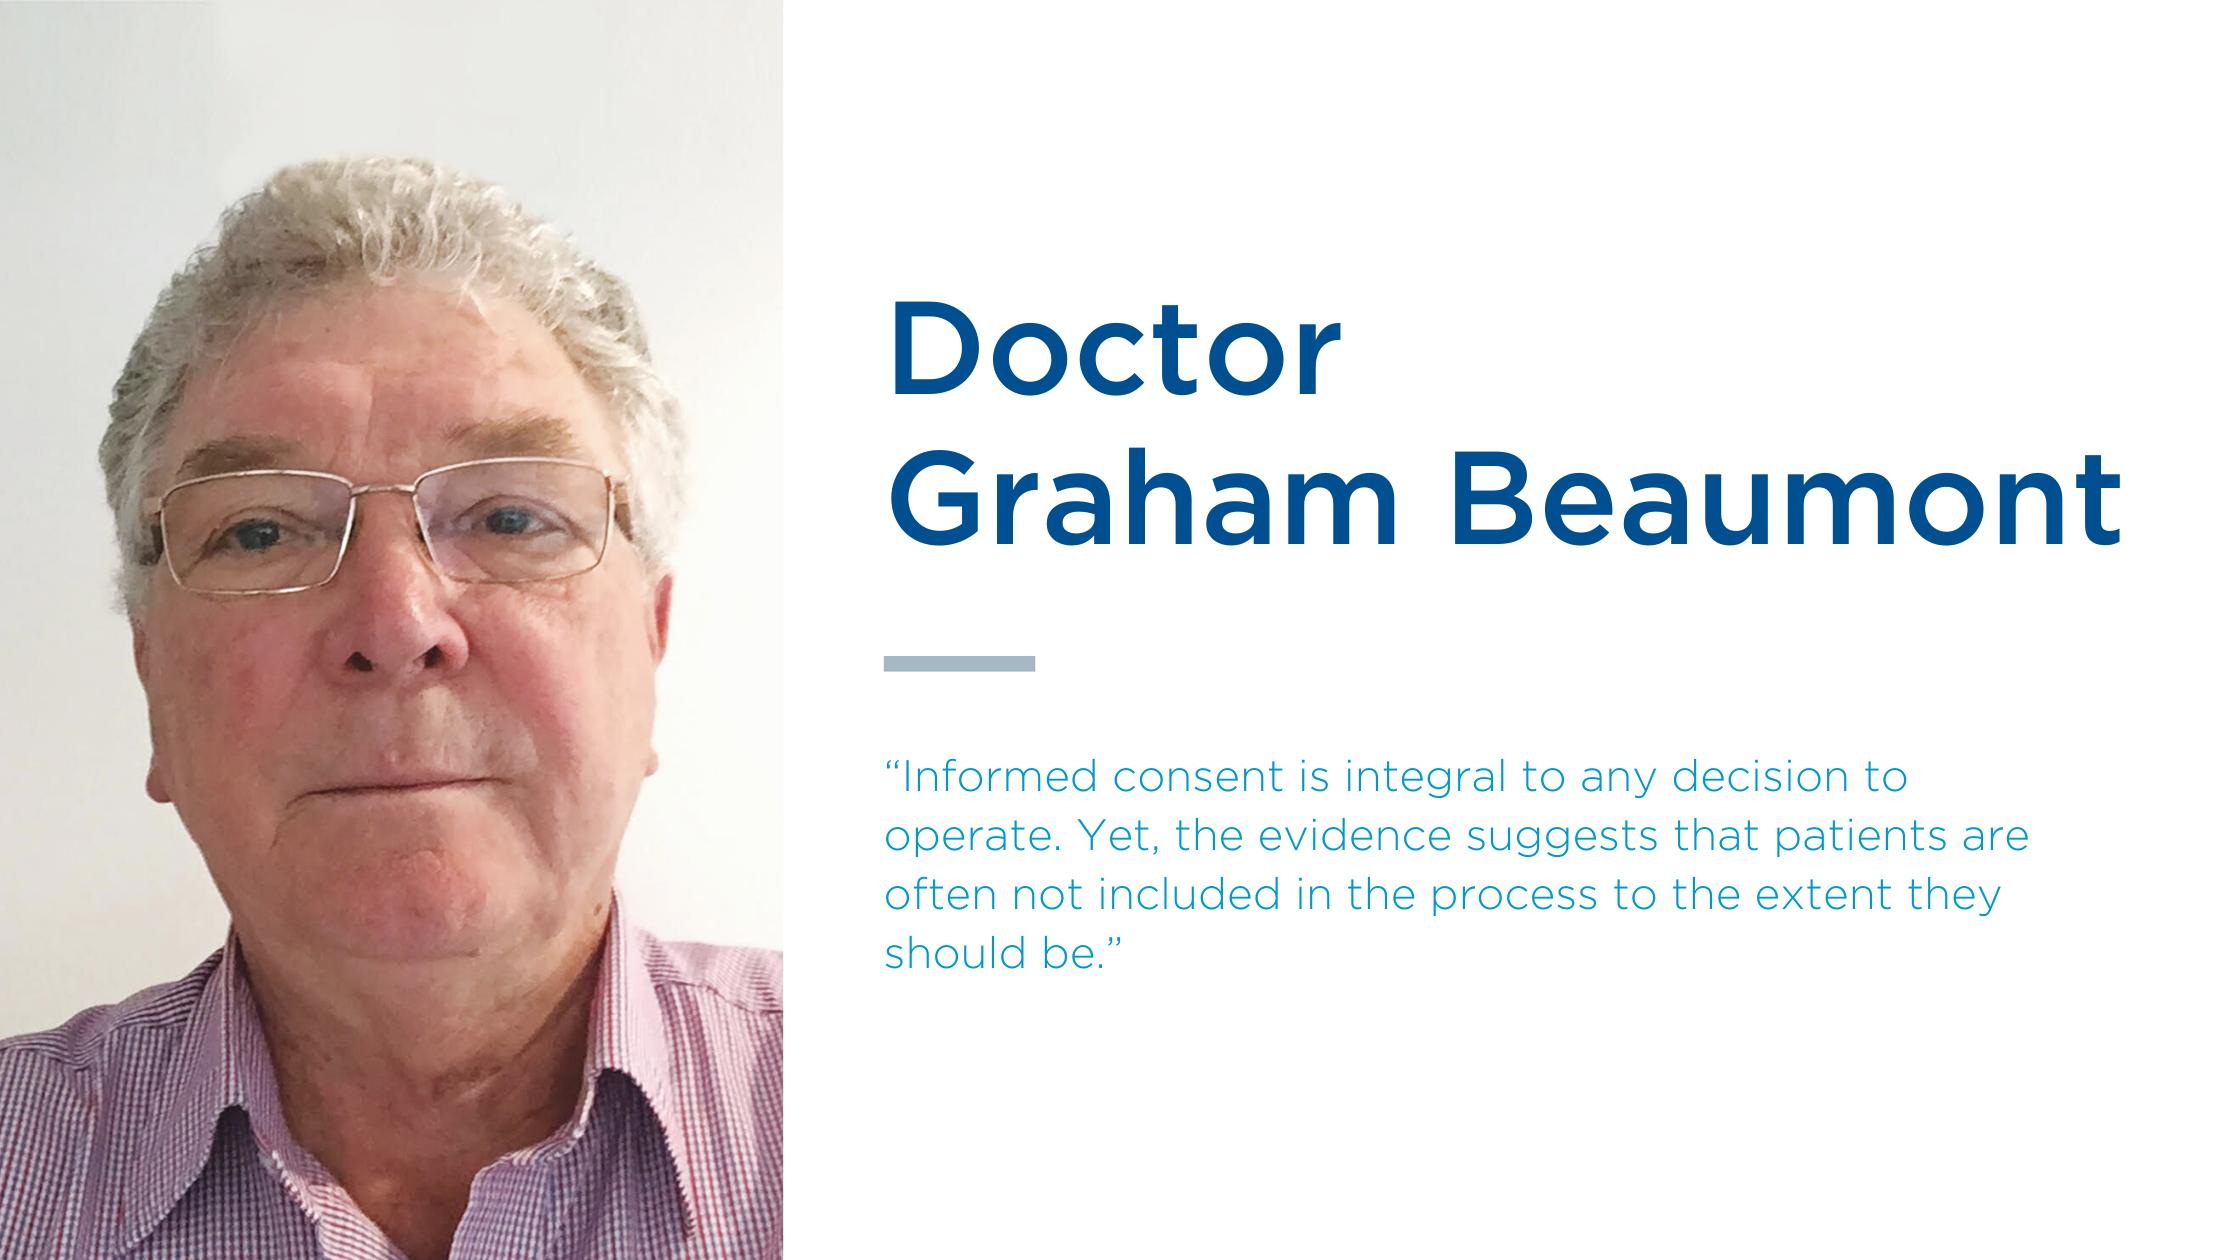 Dr Graham Beaumont explains how to gain informed patient consent to minimise risk